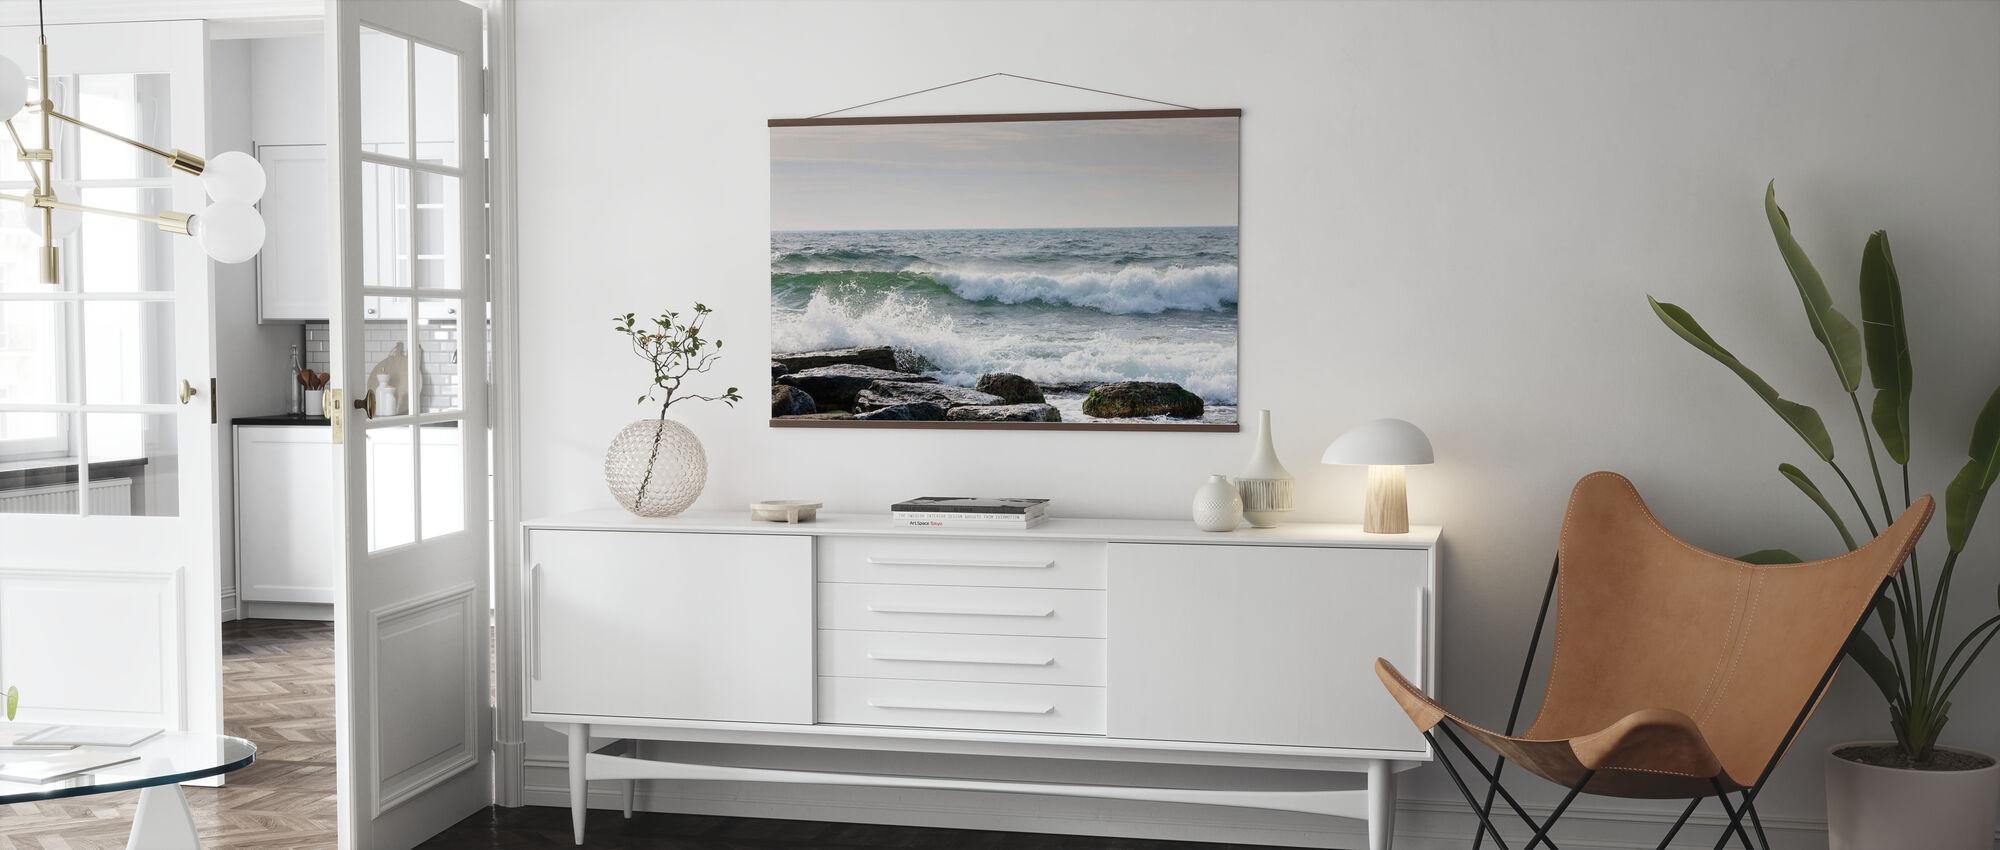 Breakers - Poster - Living Room